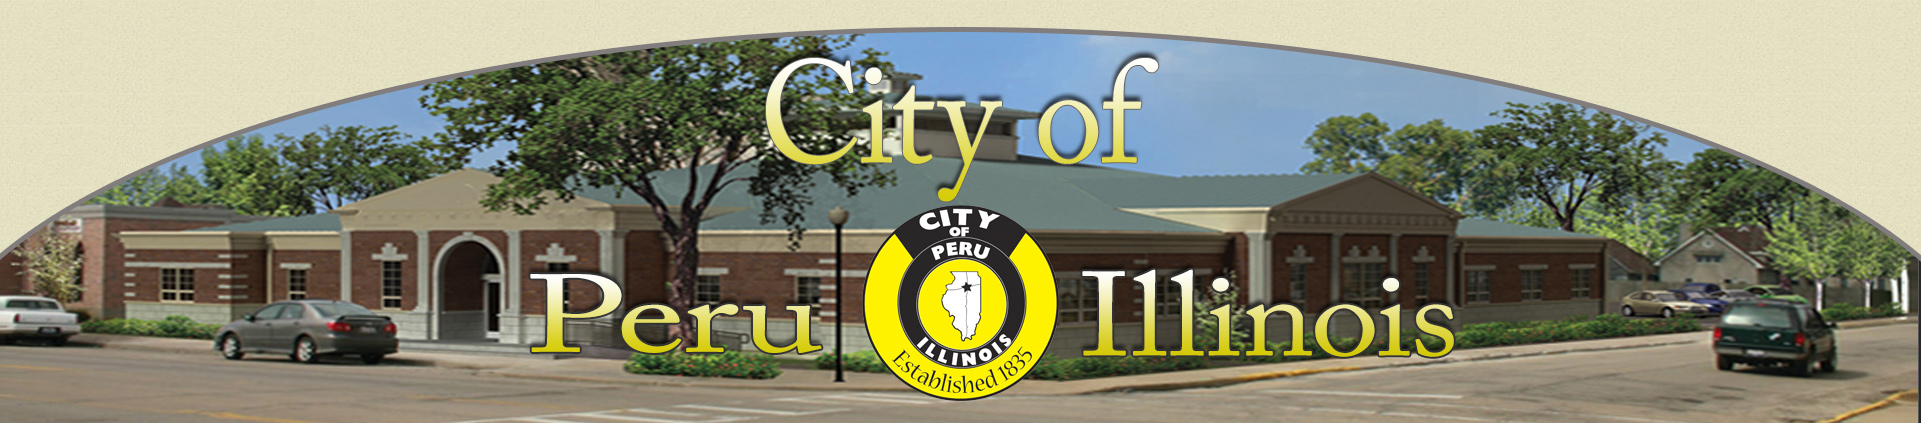 government agenda minutes videos news city of peru illinois 61354